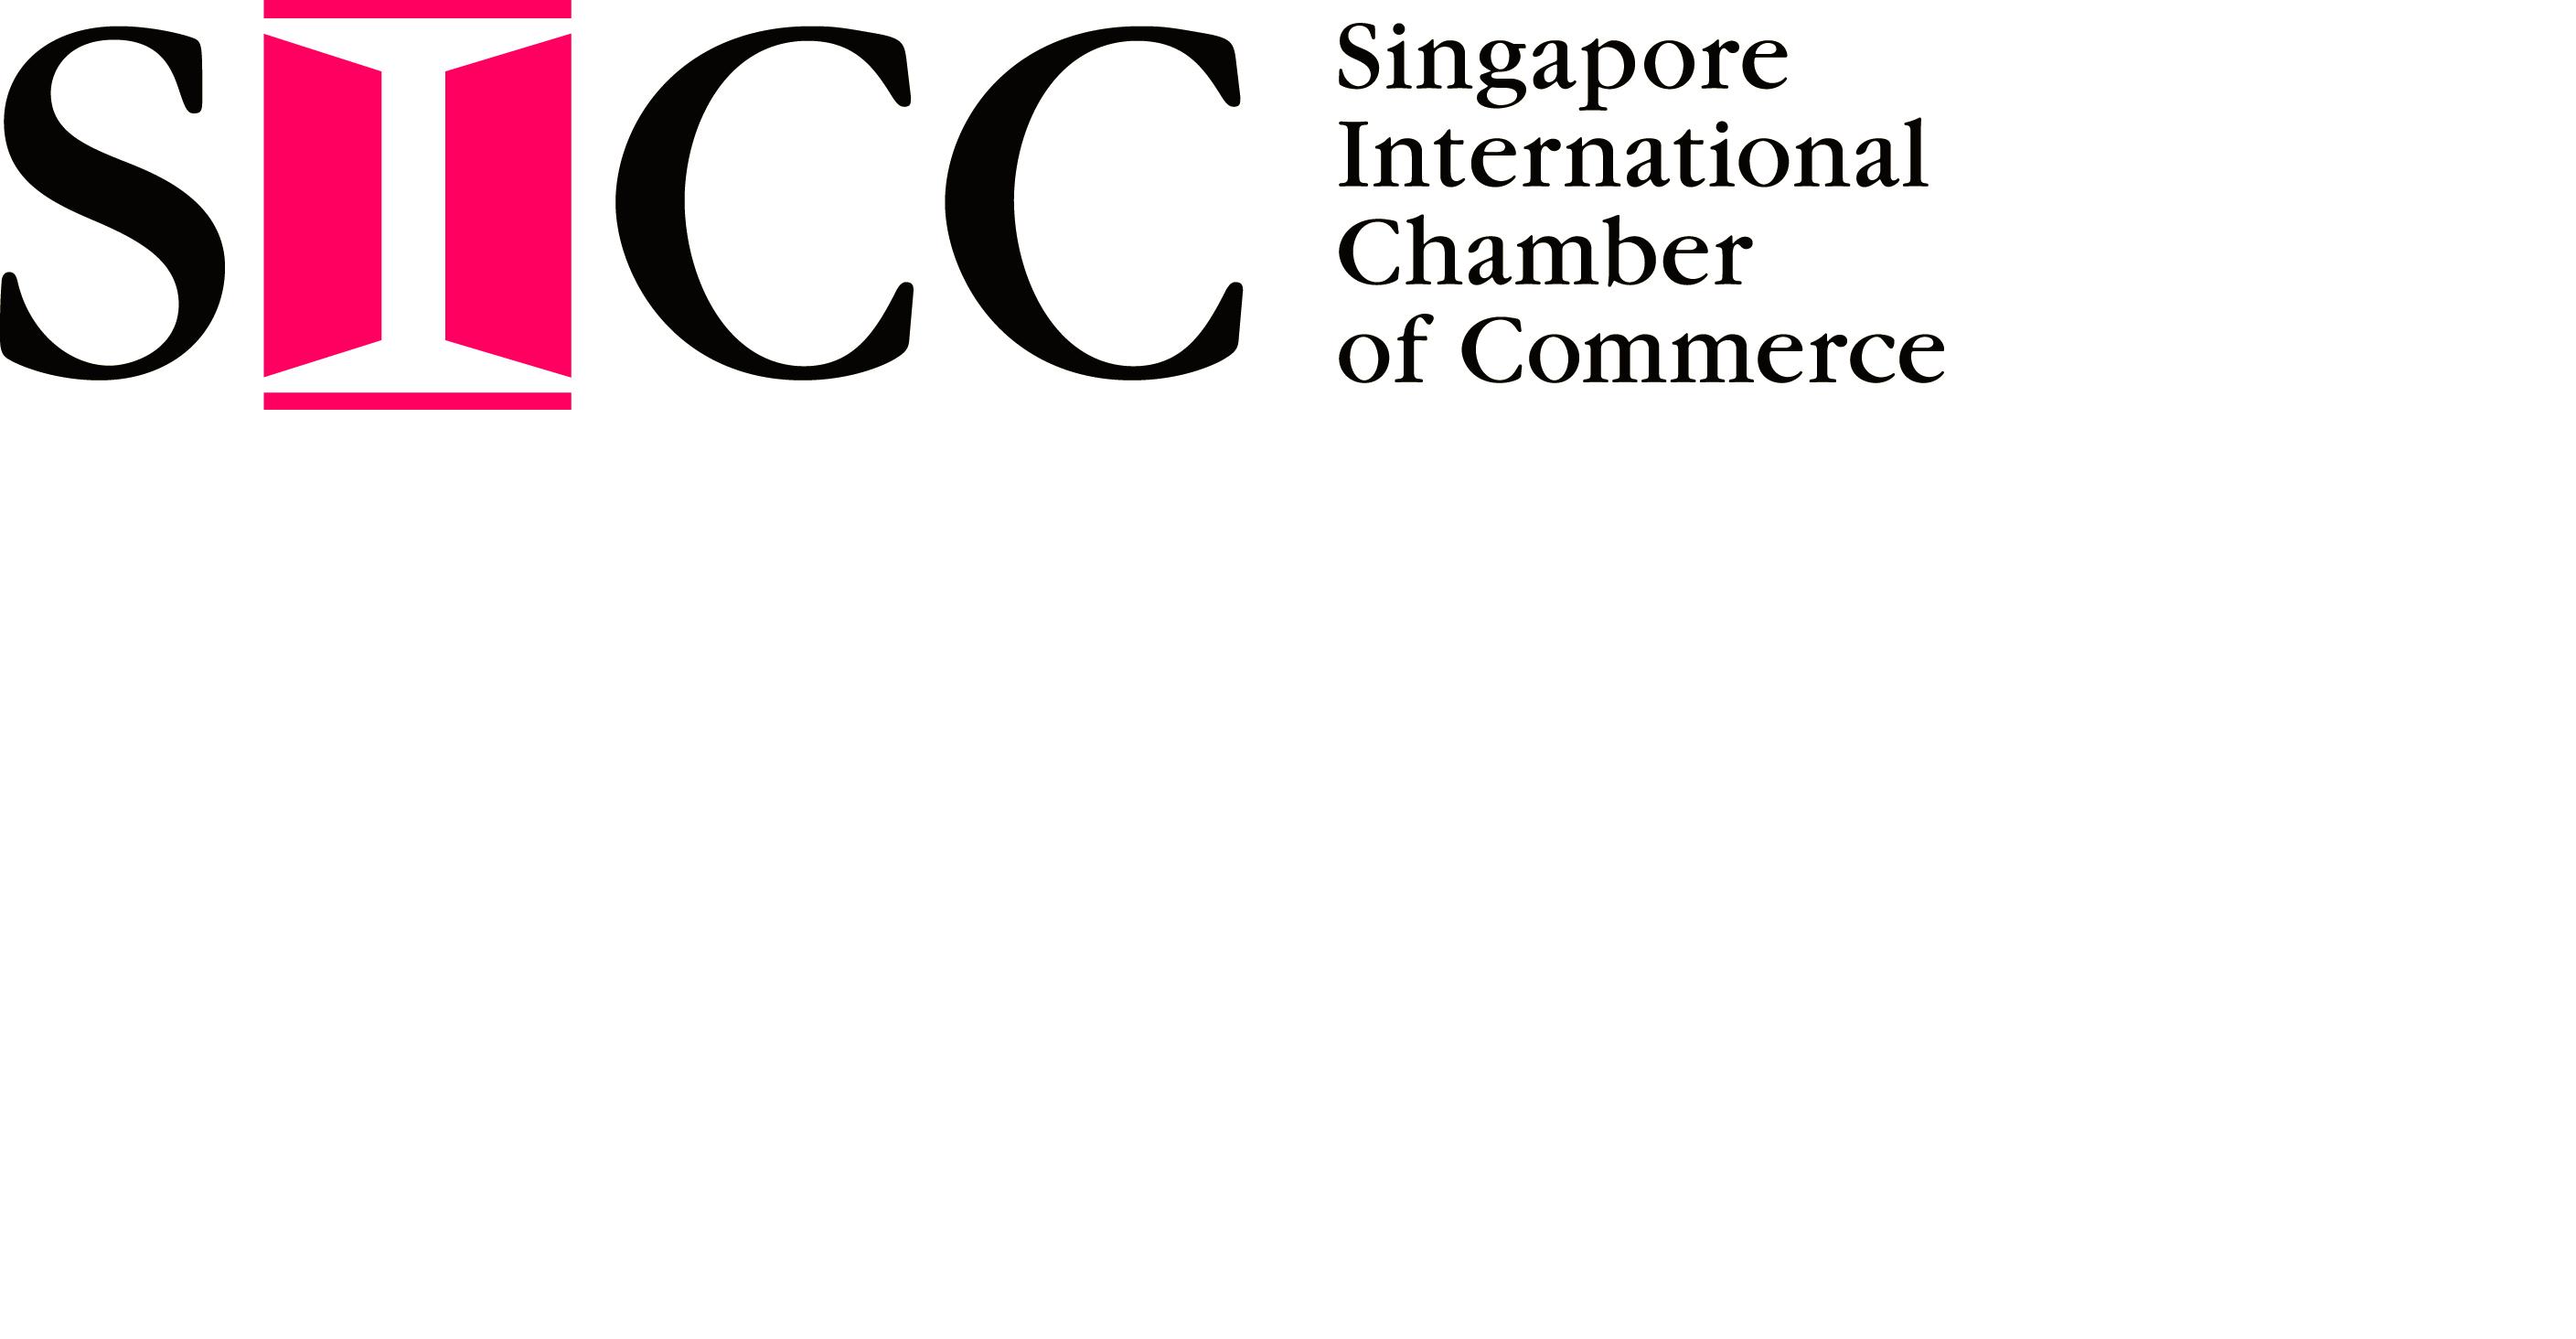 Singapore International Chamber of Commerce